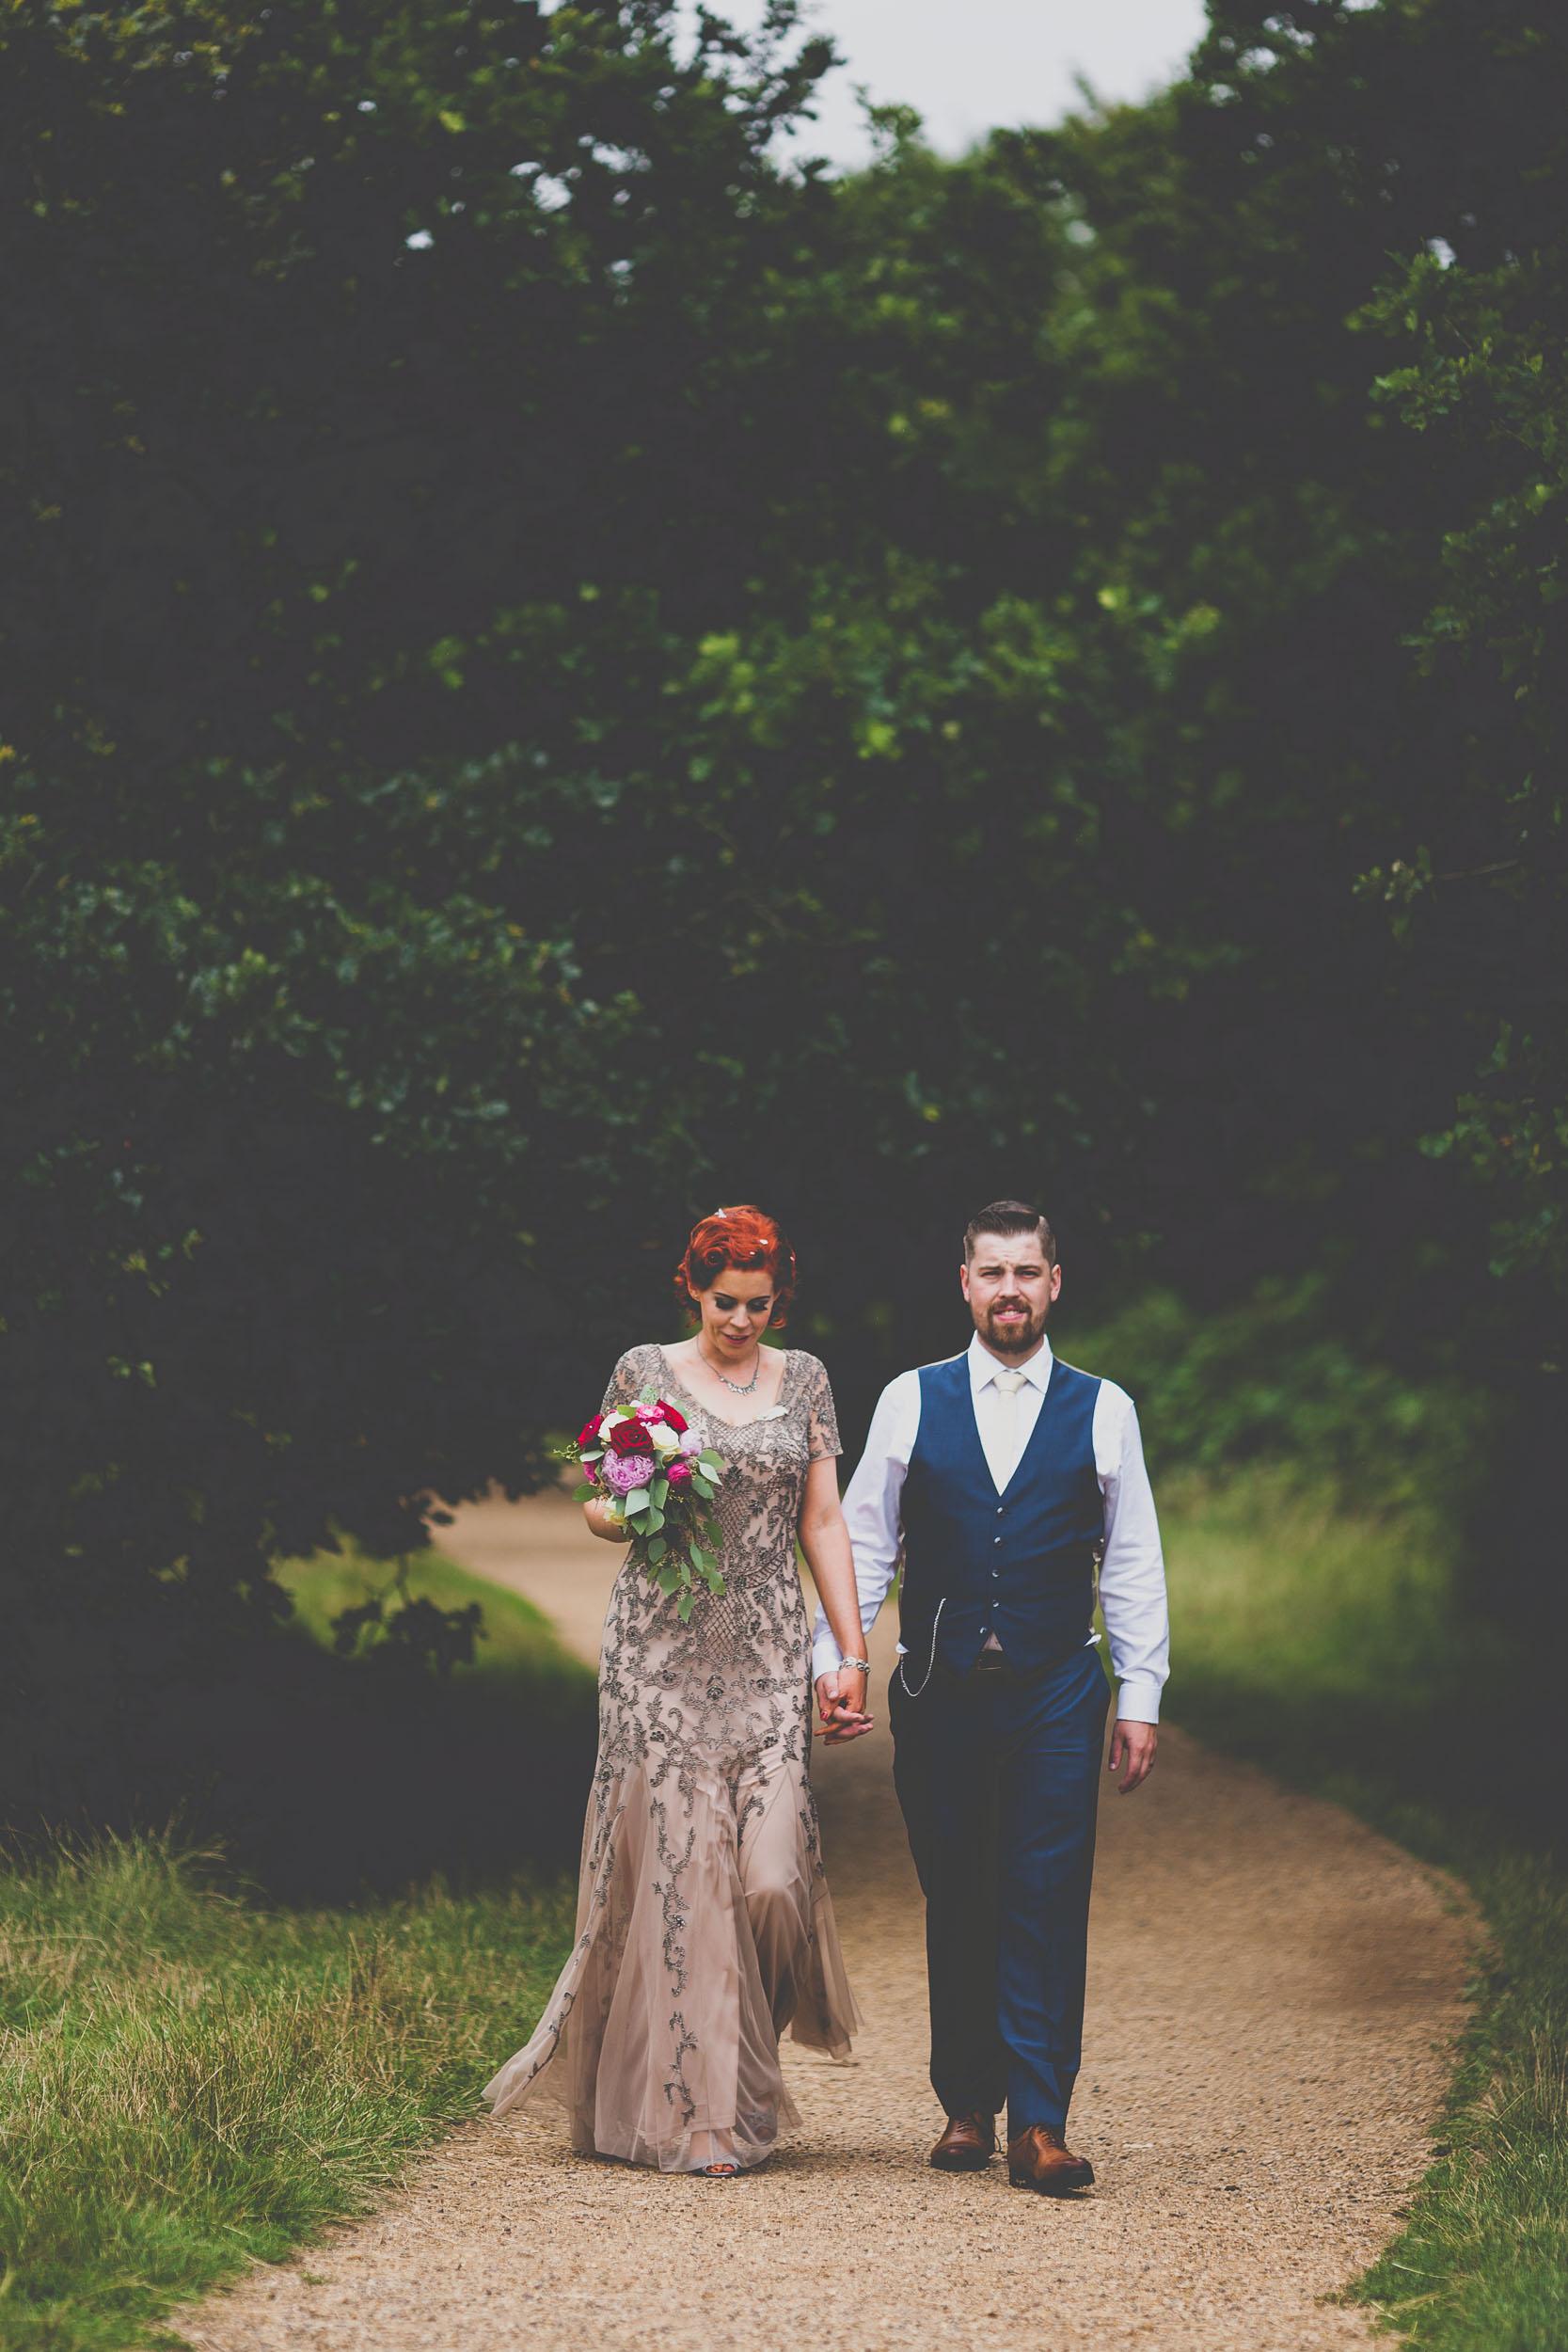 queen-elizabeths-hunting-lodge-epping-forest-wedding255.jpg